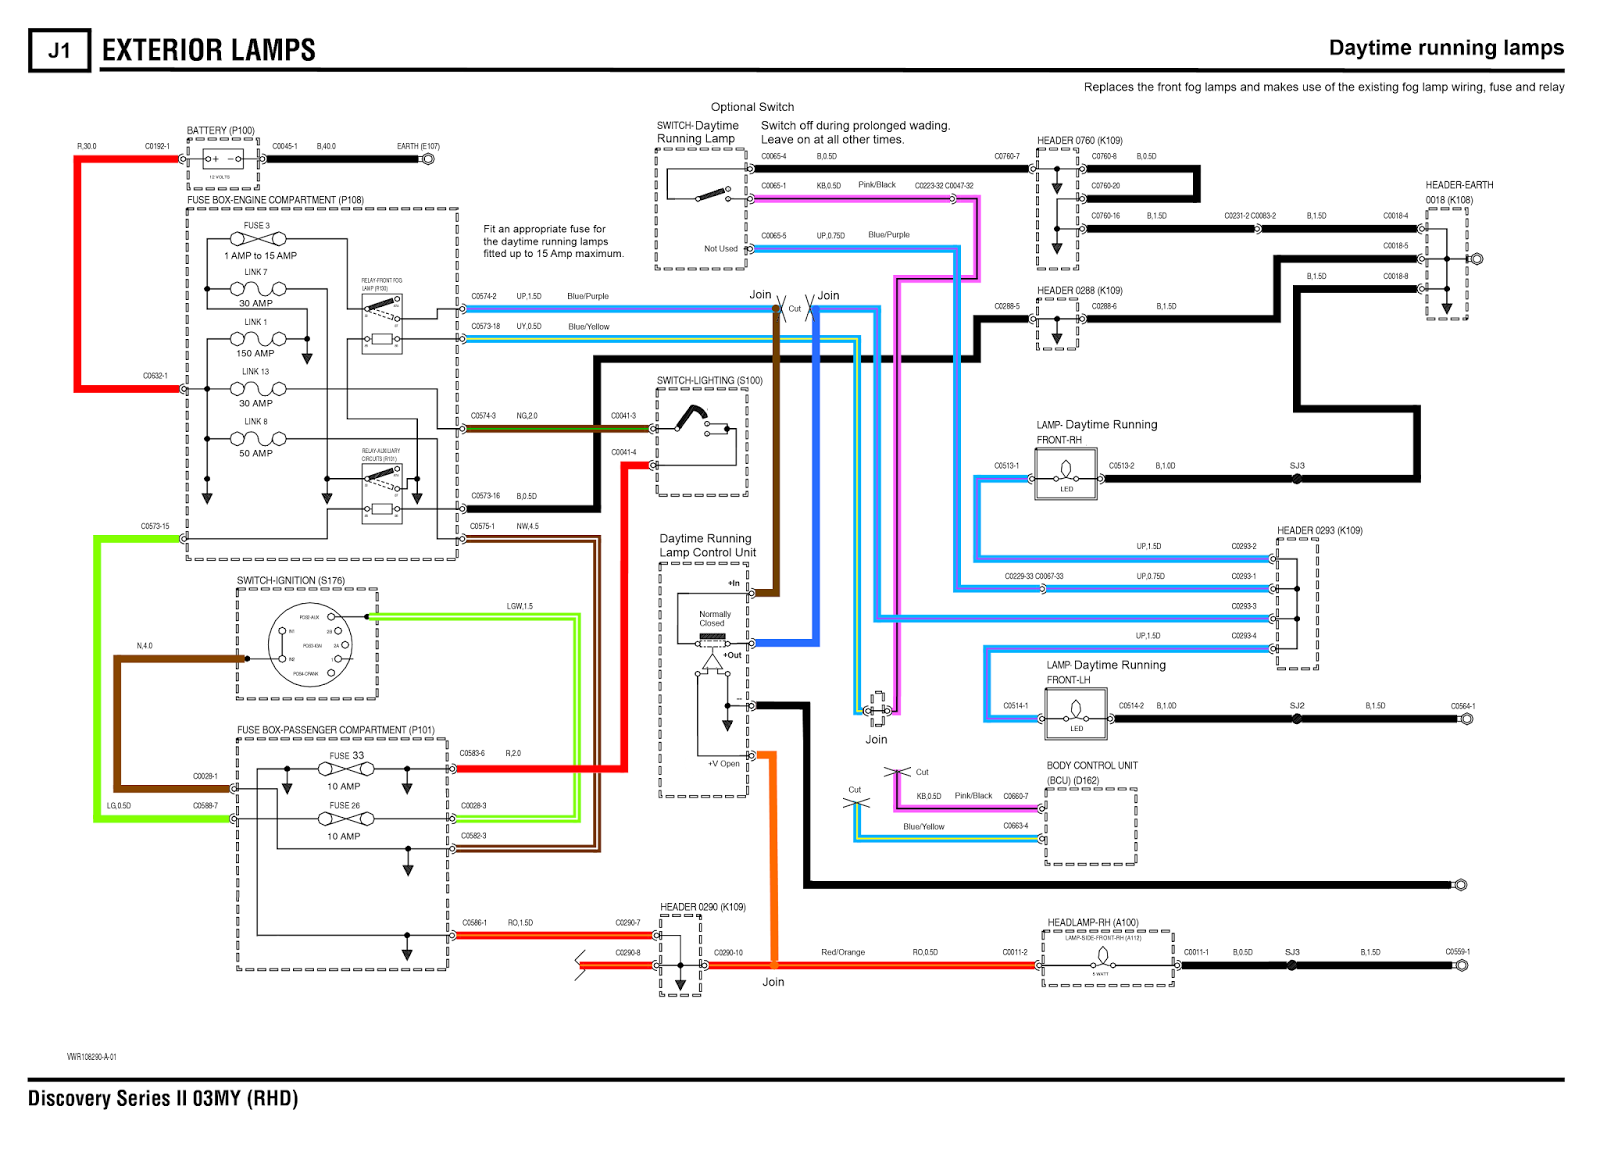 TA_8640] 1997 Land Rover Discovery Radio Wiring Download DiagramHison Ospor Tool Tixat Mohammedshrine Librar Wiring 101